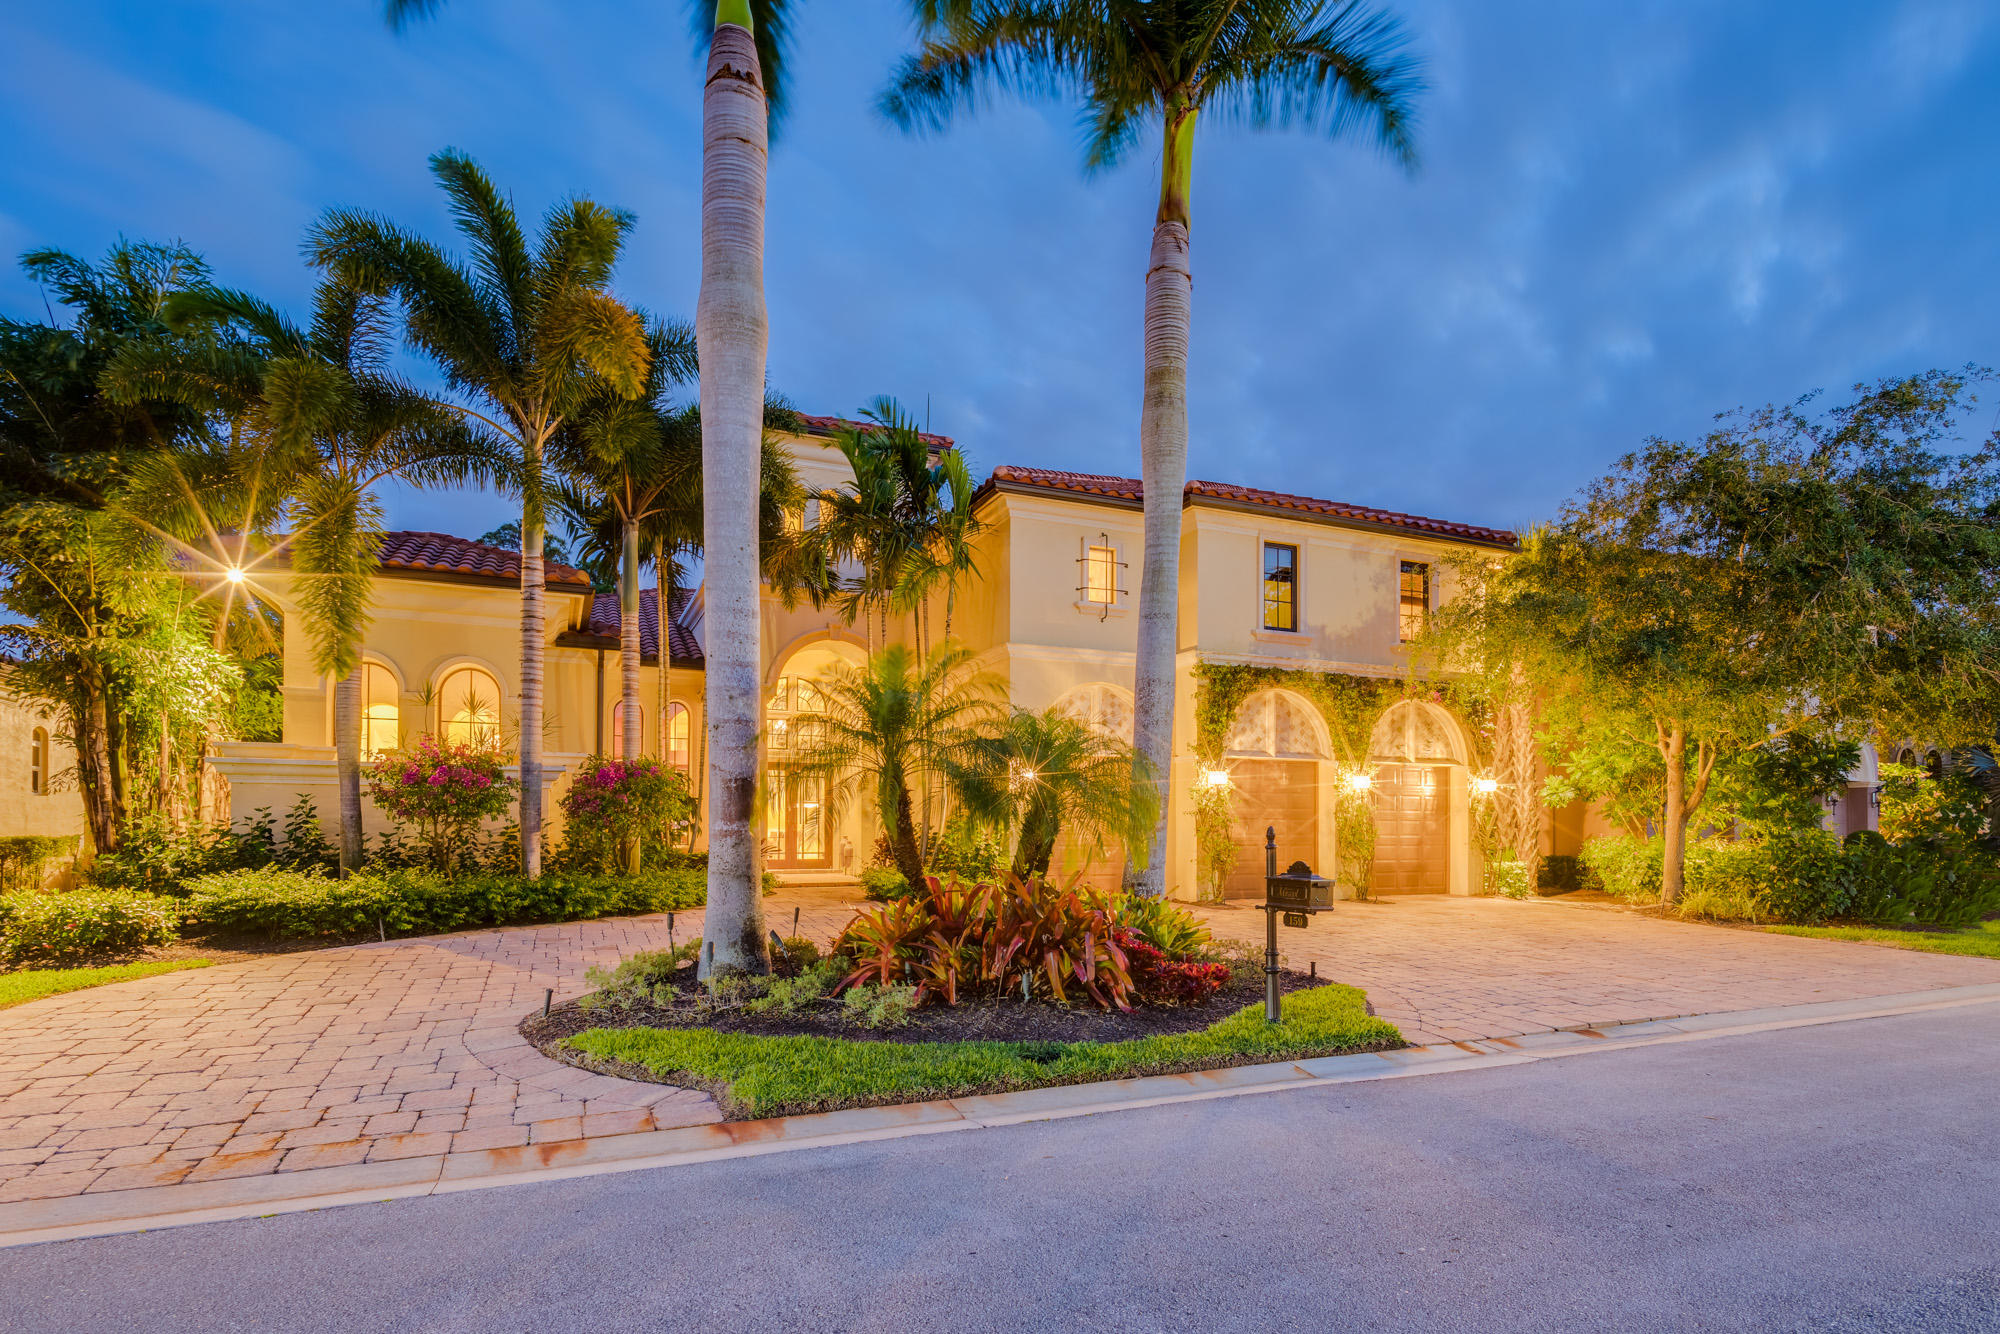 159 Remo Place, Palm Beach Gardens, Florida 33418, 4 Bedrooms Bedrooms, ,4.1 BathroomsBathrooms,A,Single family,Remo,RX-10608364